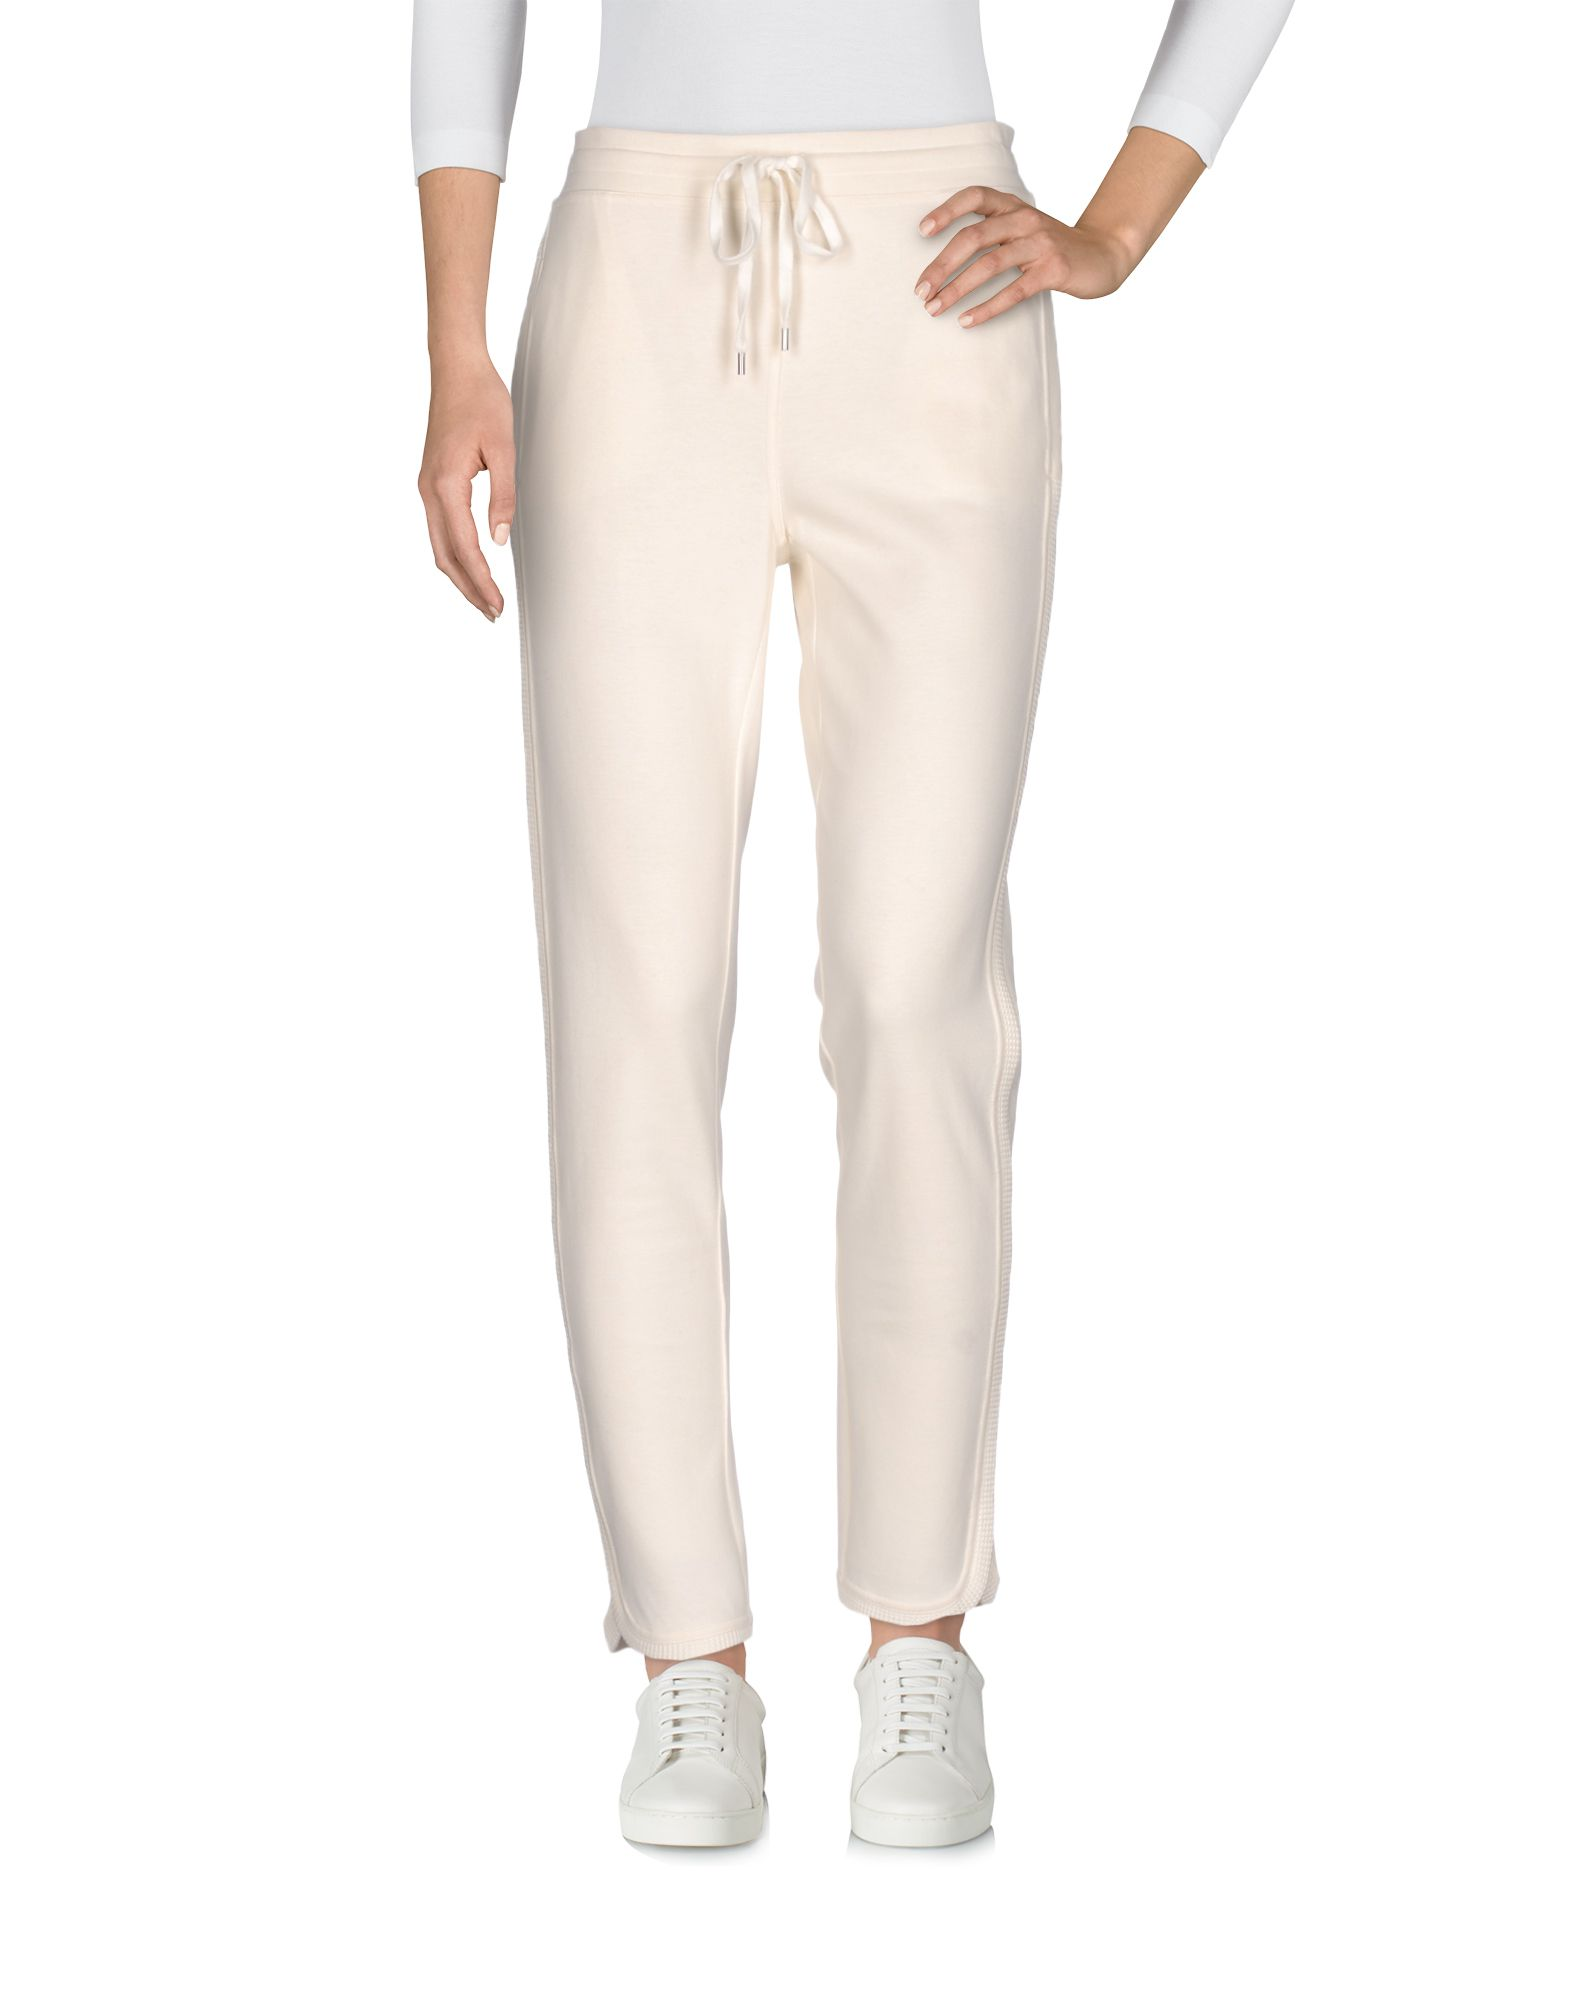 Pantalone Maison Ullens Donna - Acquista online su rPHzwtWz